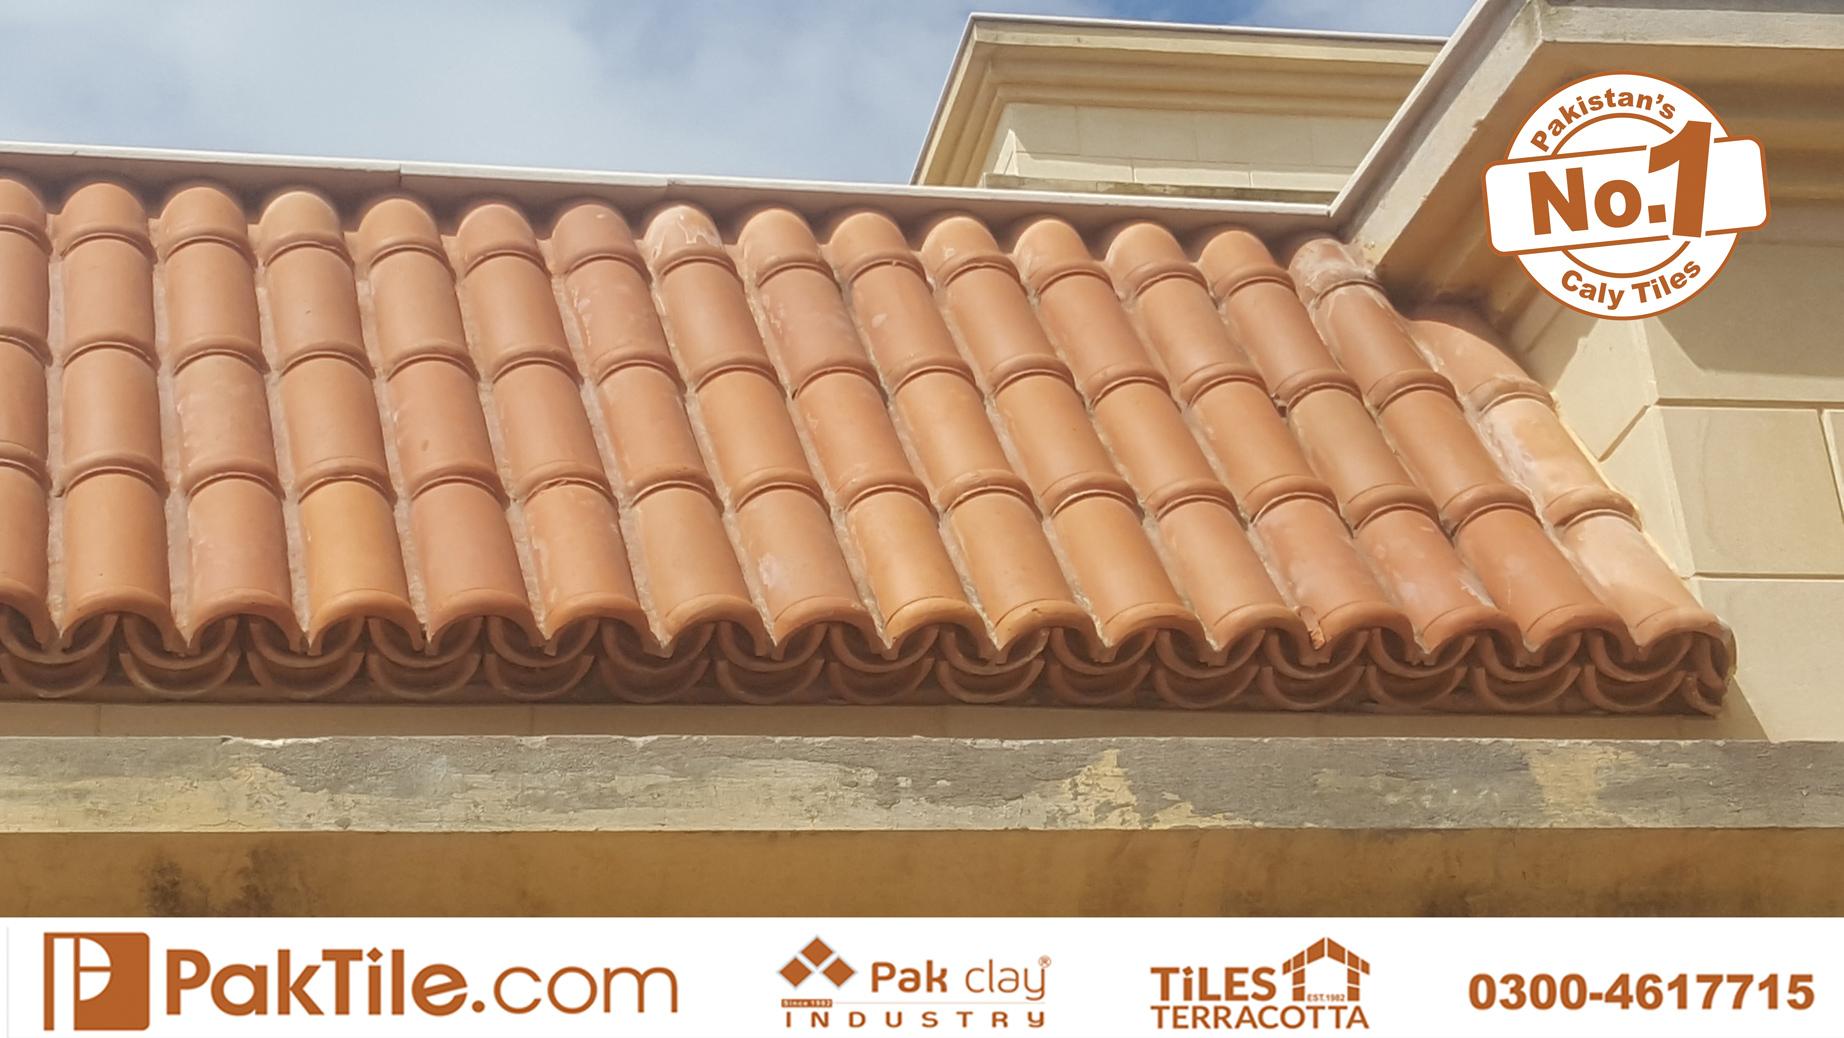 1 Terracotta Red Mud Brick Roof Tiles Pakistan Khaprail Tiles Manufacturer Shop in Lahore Karachi Images